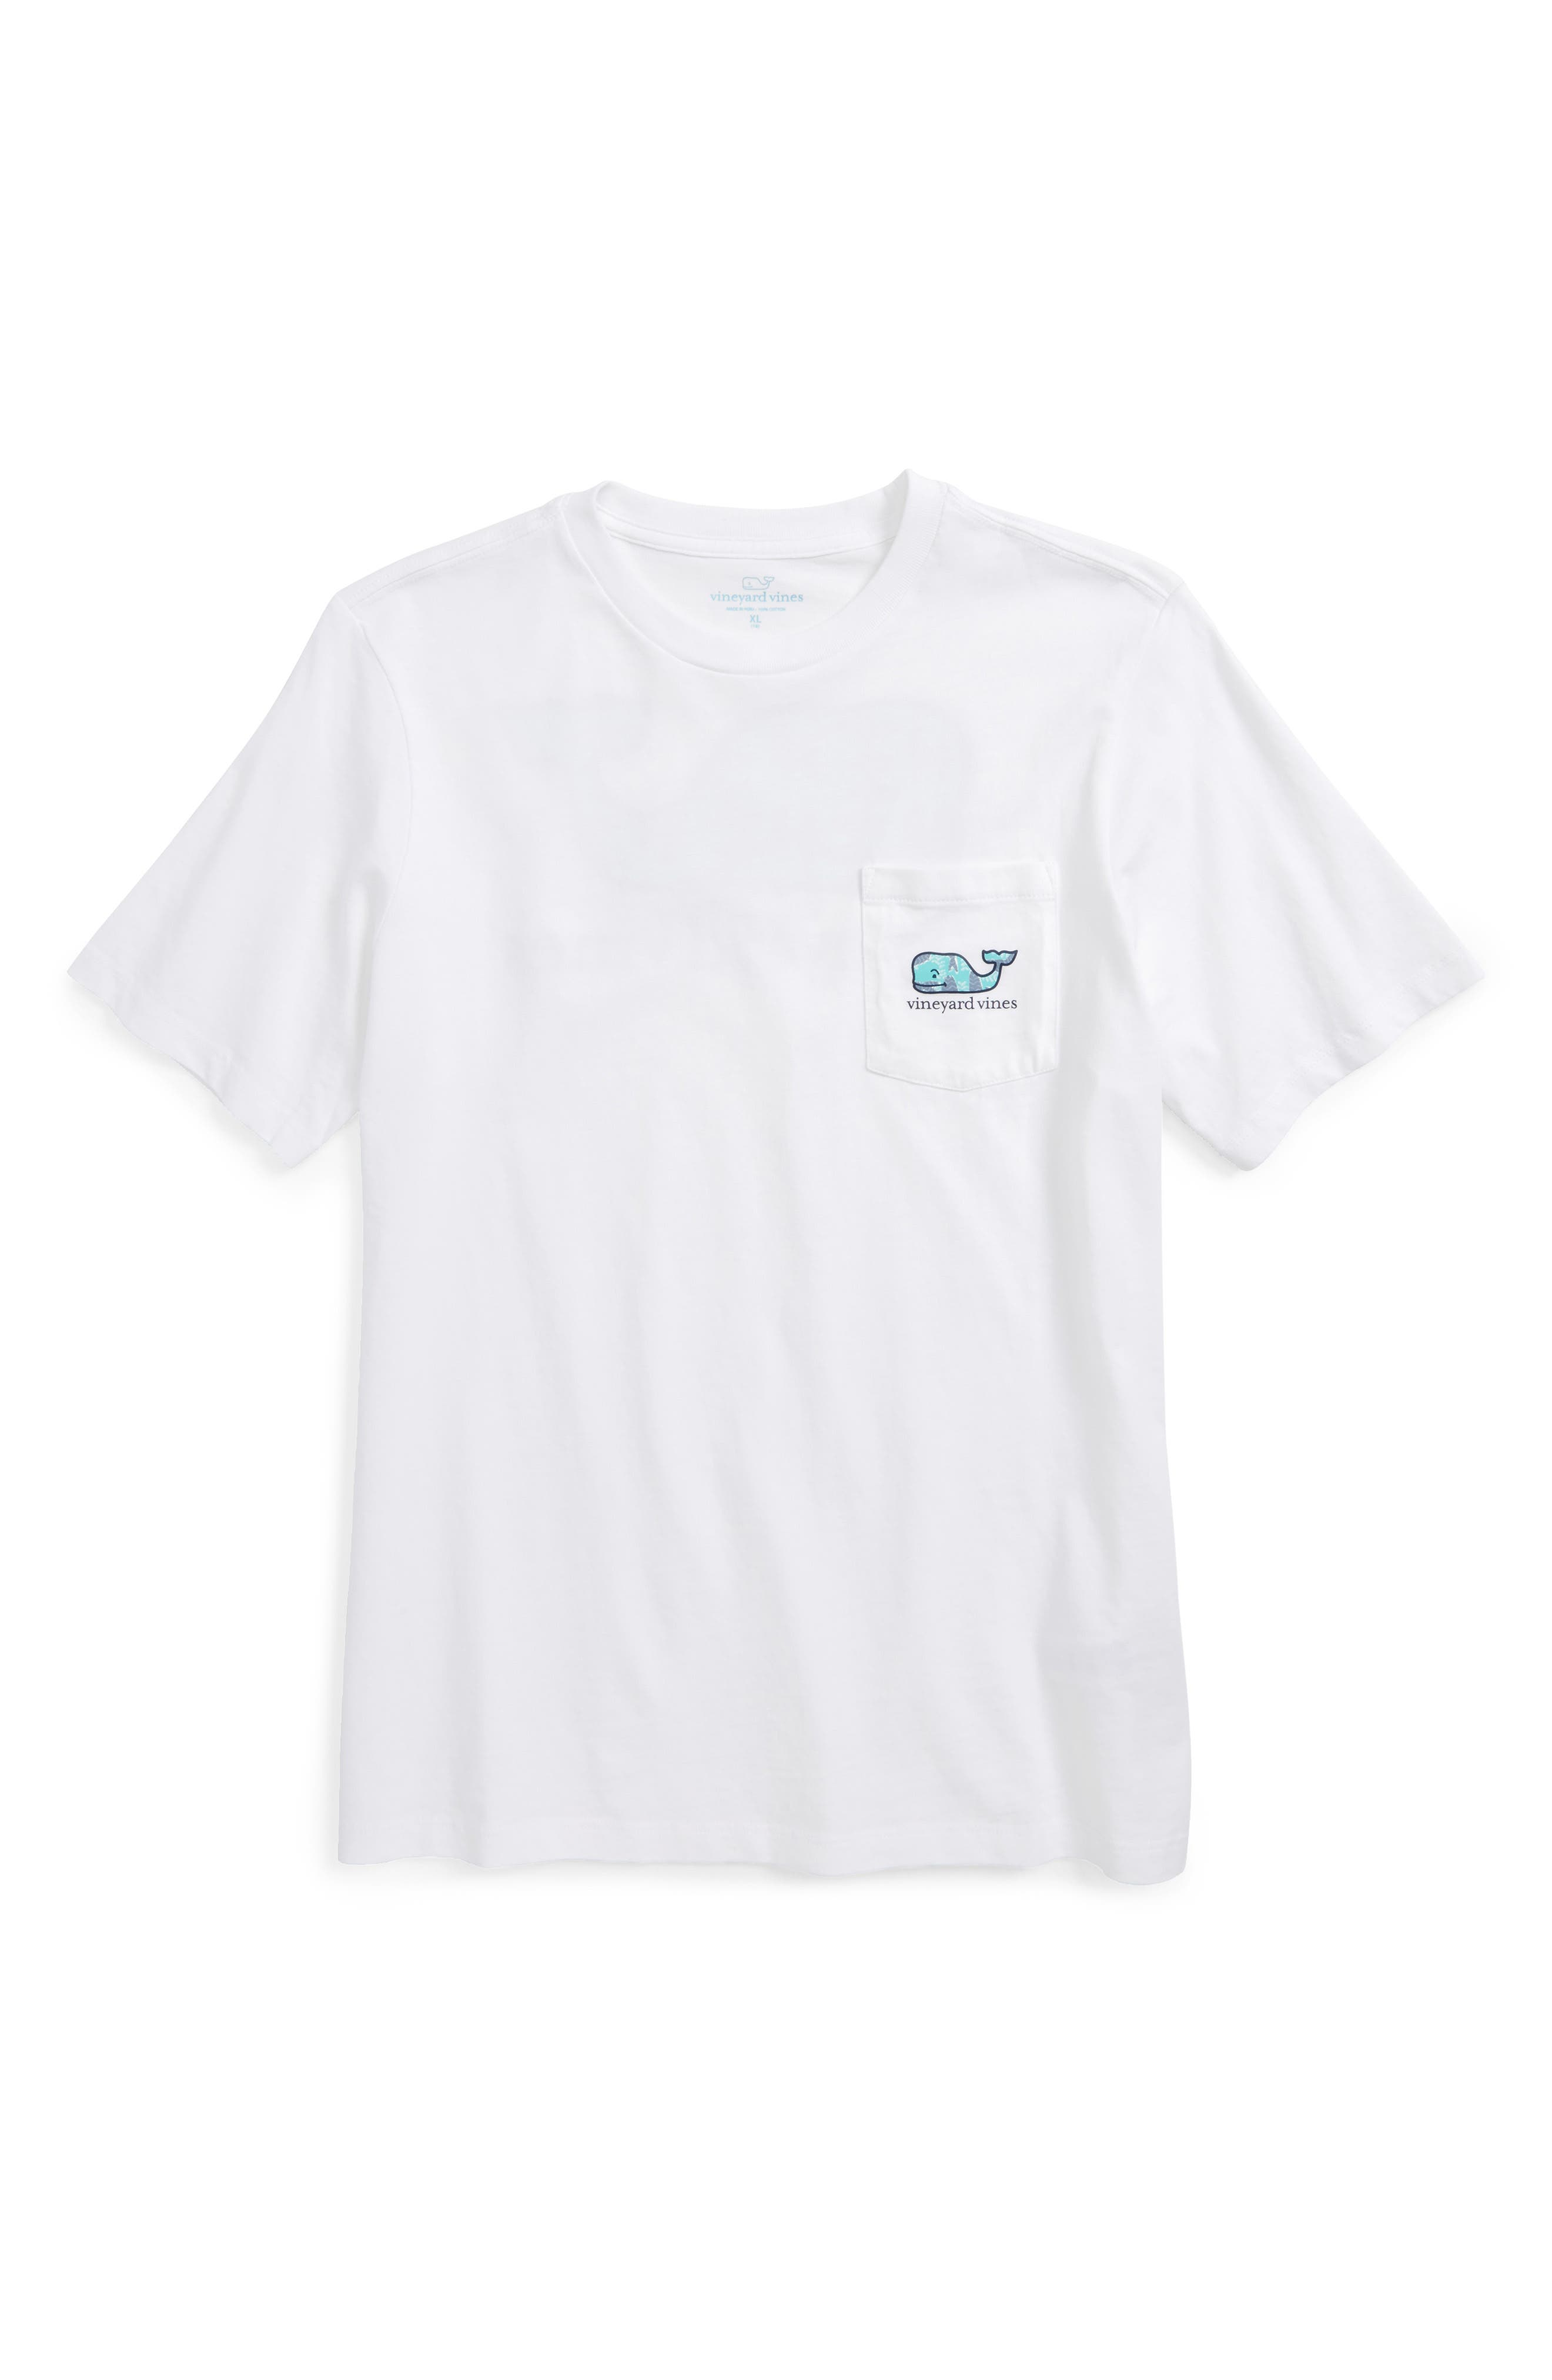 Vineyard Vines Chevron Fish Graphic T-Shirt (Big Boys)